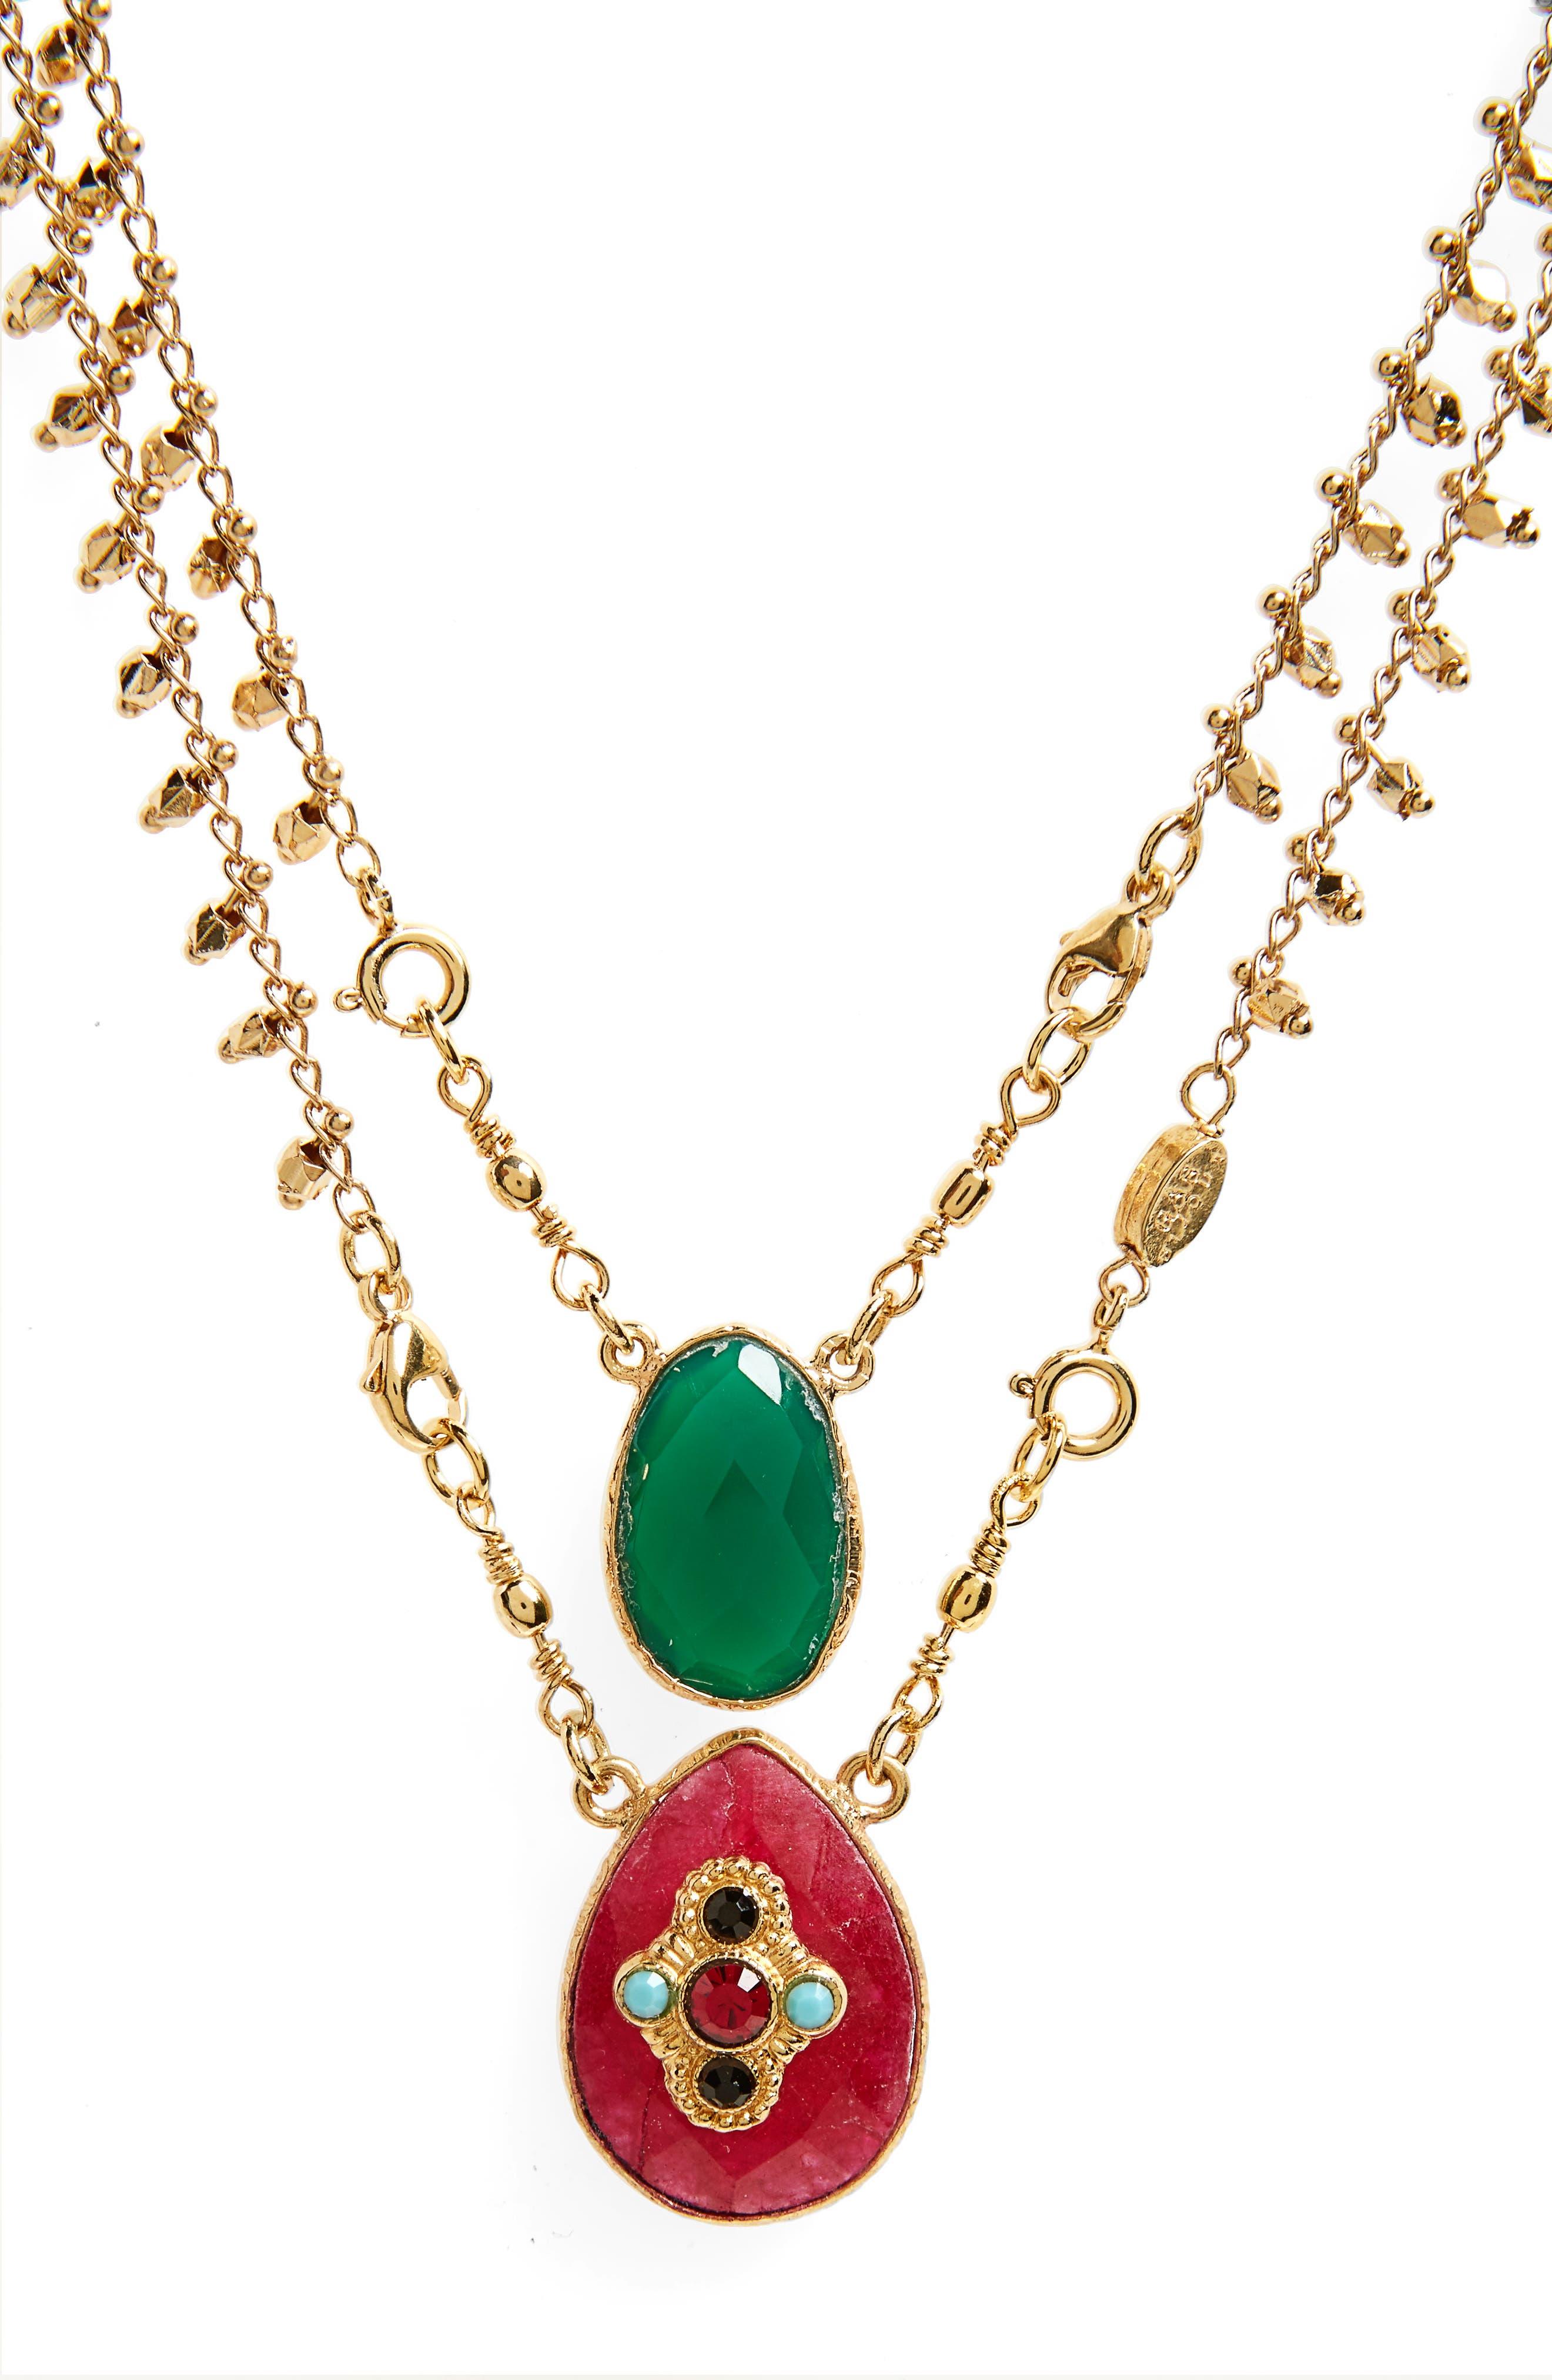 Gas Bijoux Scapulaire Convertible Semiprecious Stone Necklace